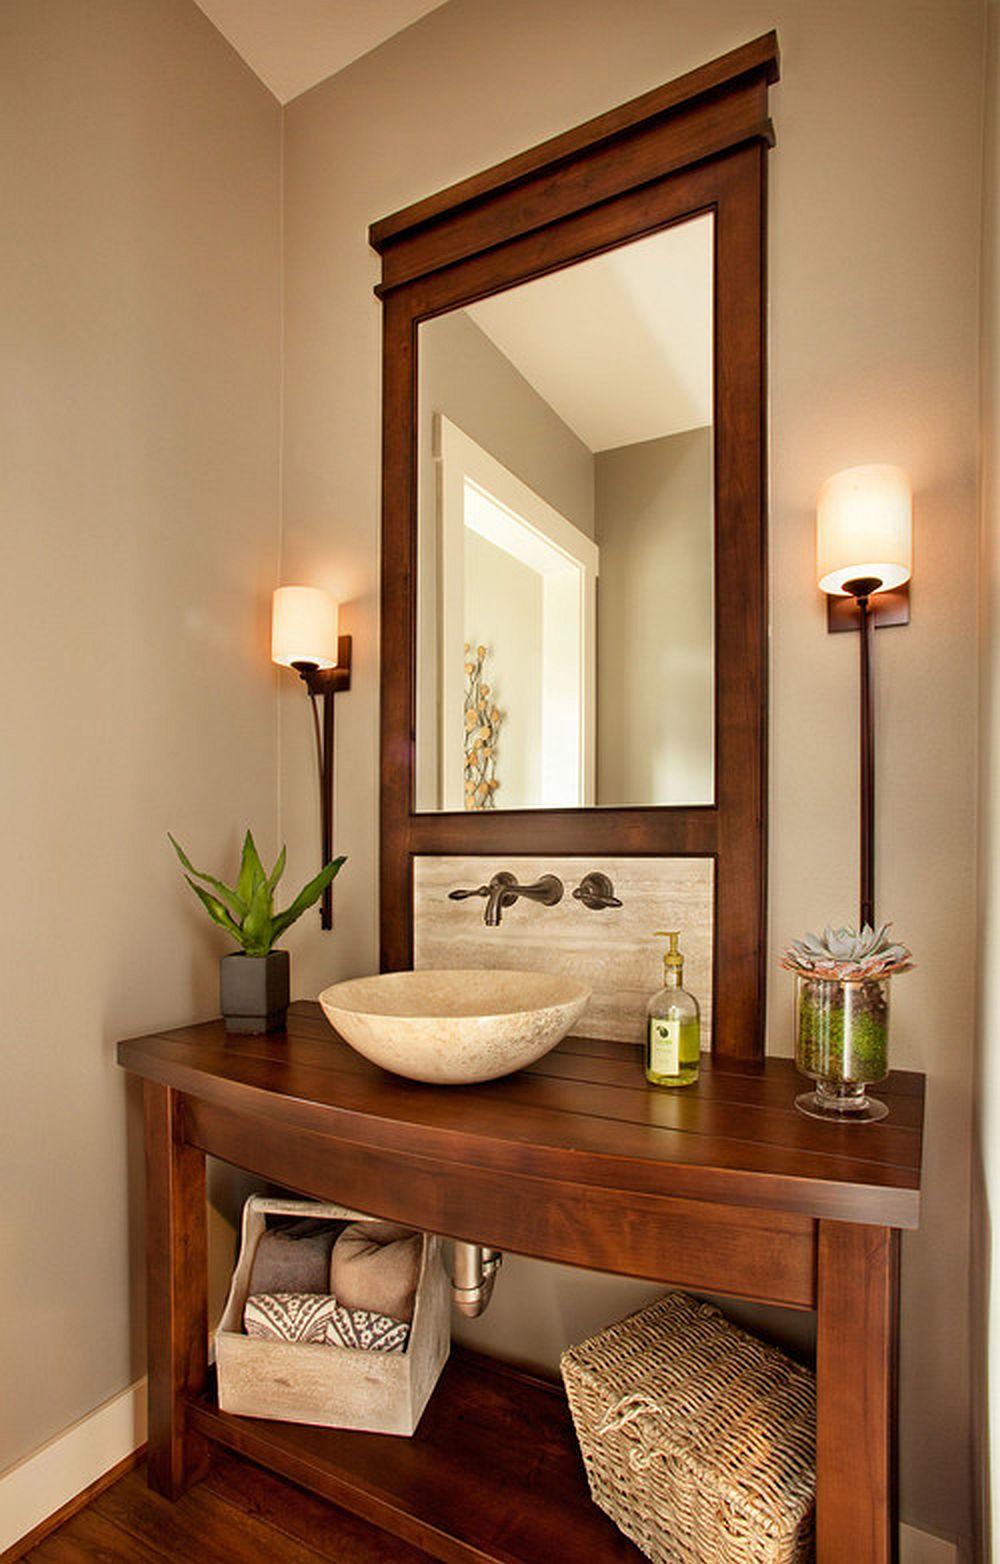 adelaparvu.com despre amenajare interior casa cu accente rustice, designer Garrison Hullinger, Foto blackstoneedge.com Foto (13)